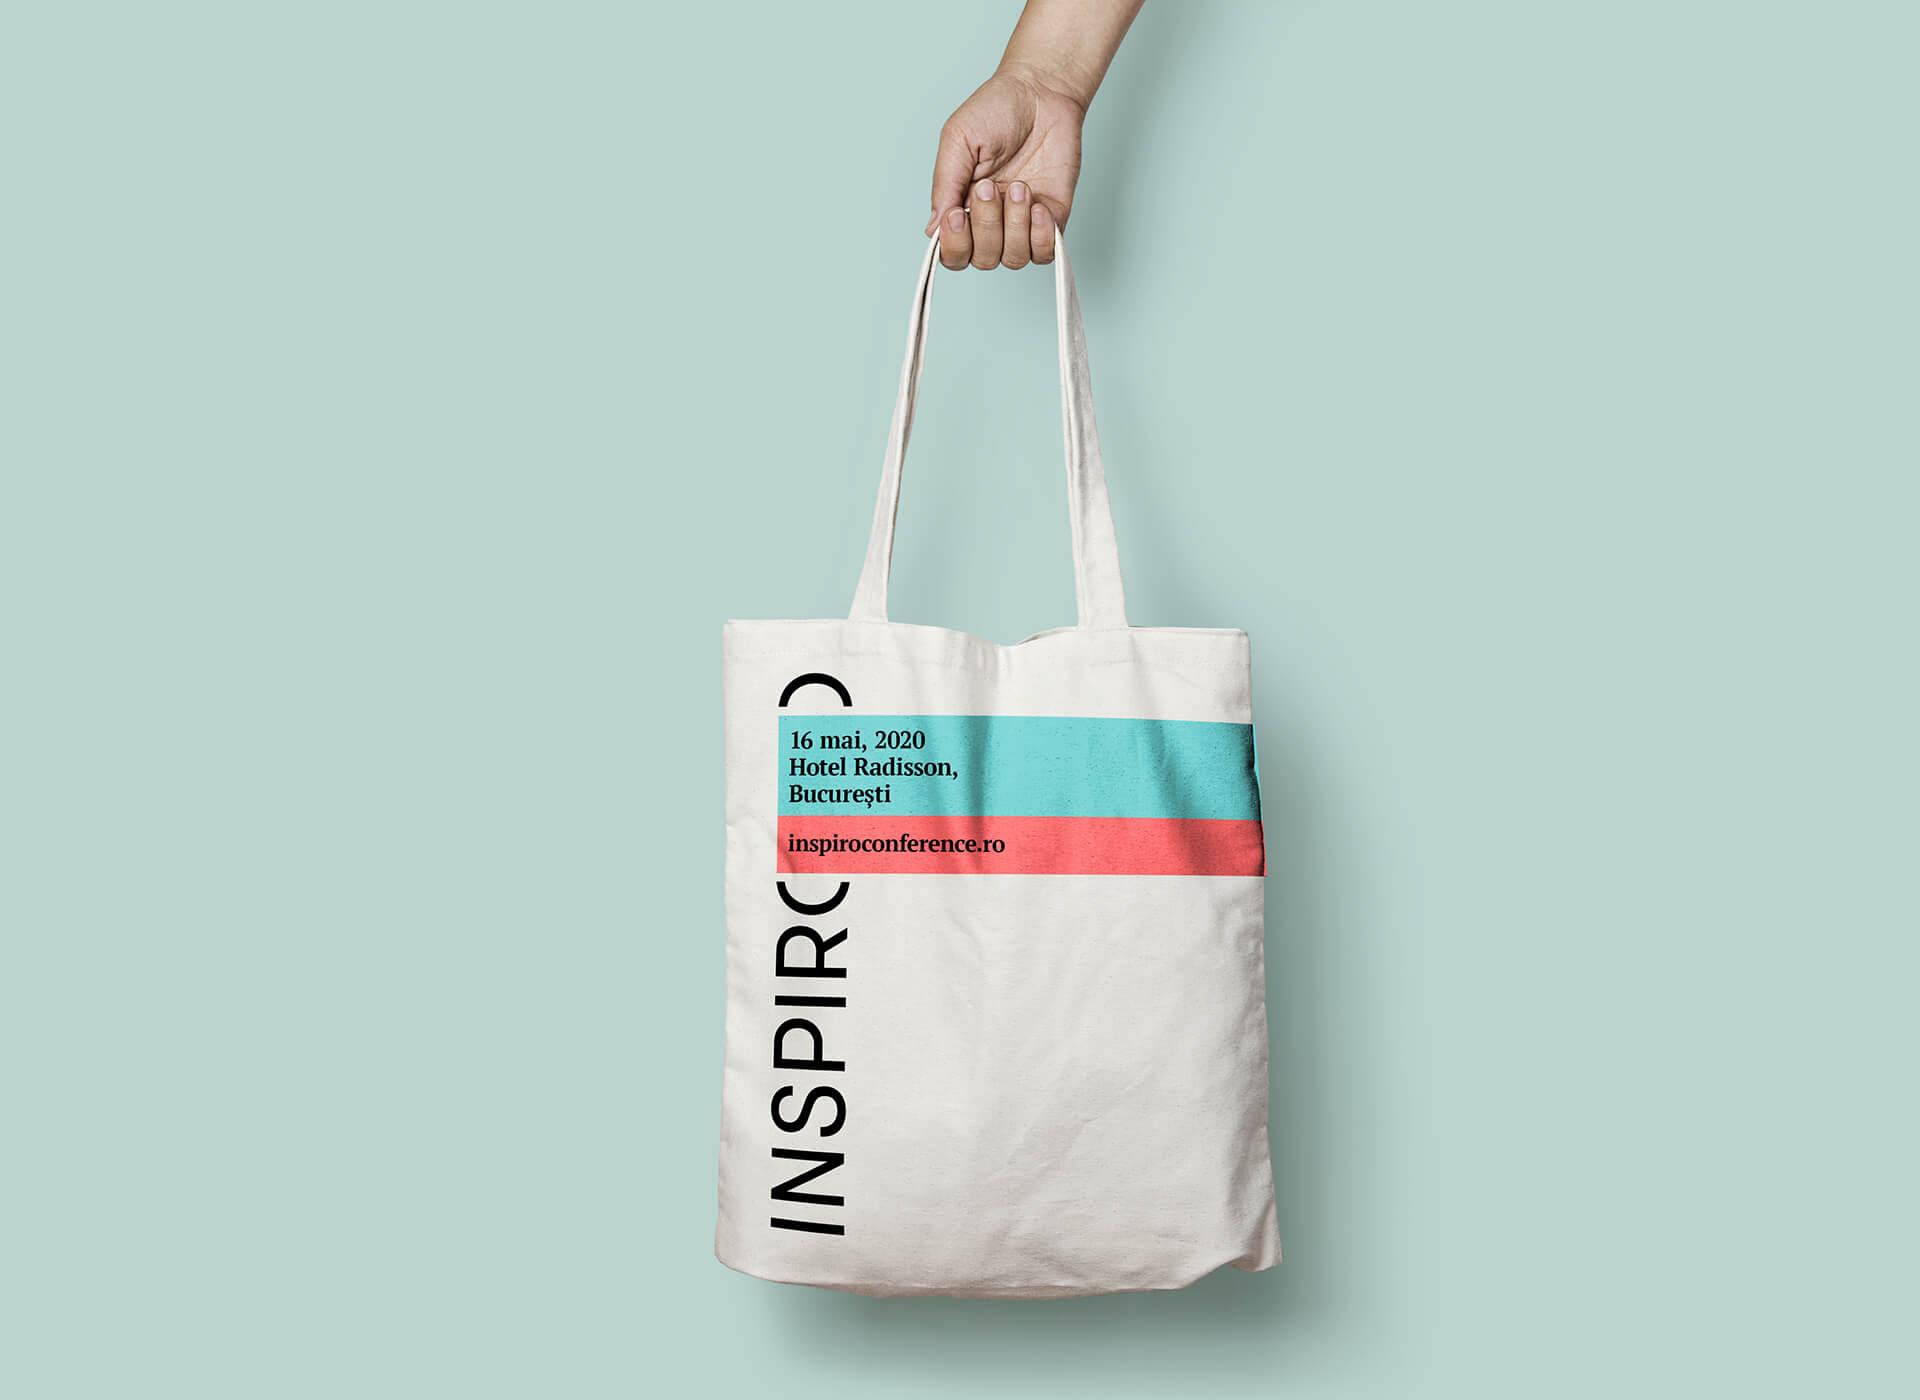 Inspiro portofoliu inoveo bag